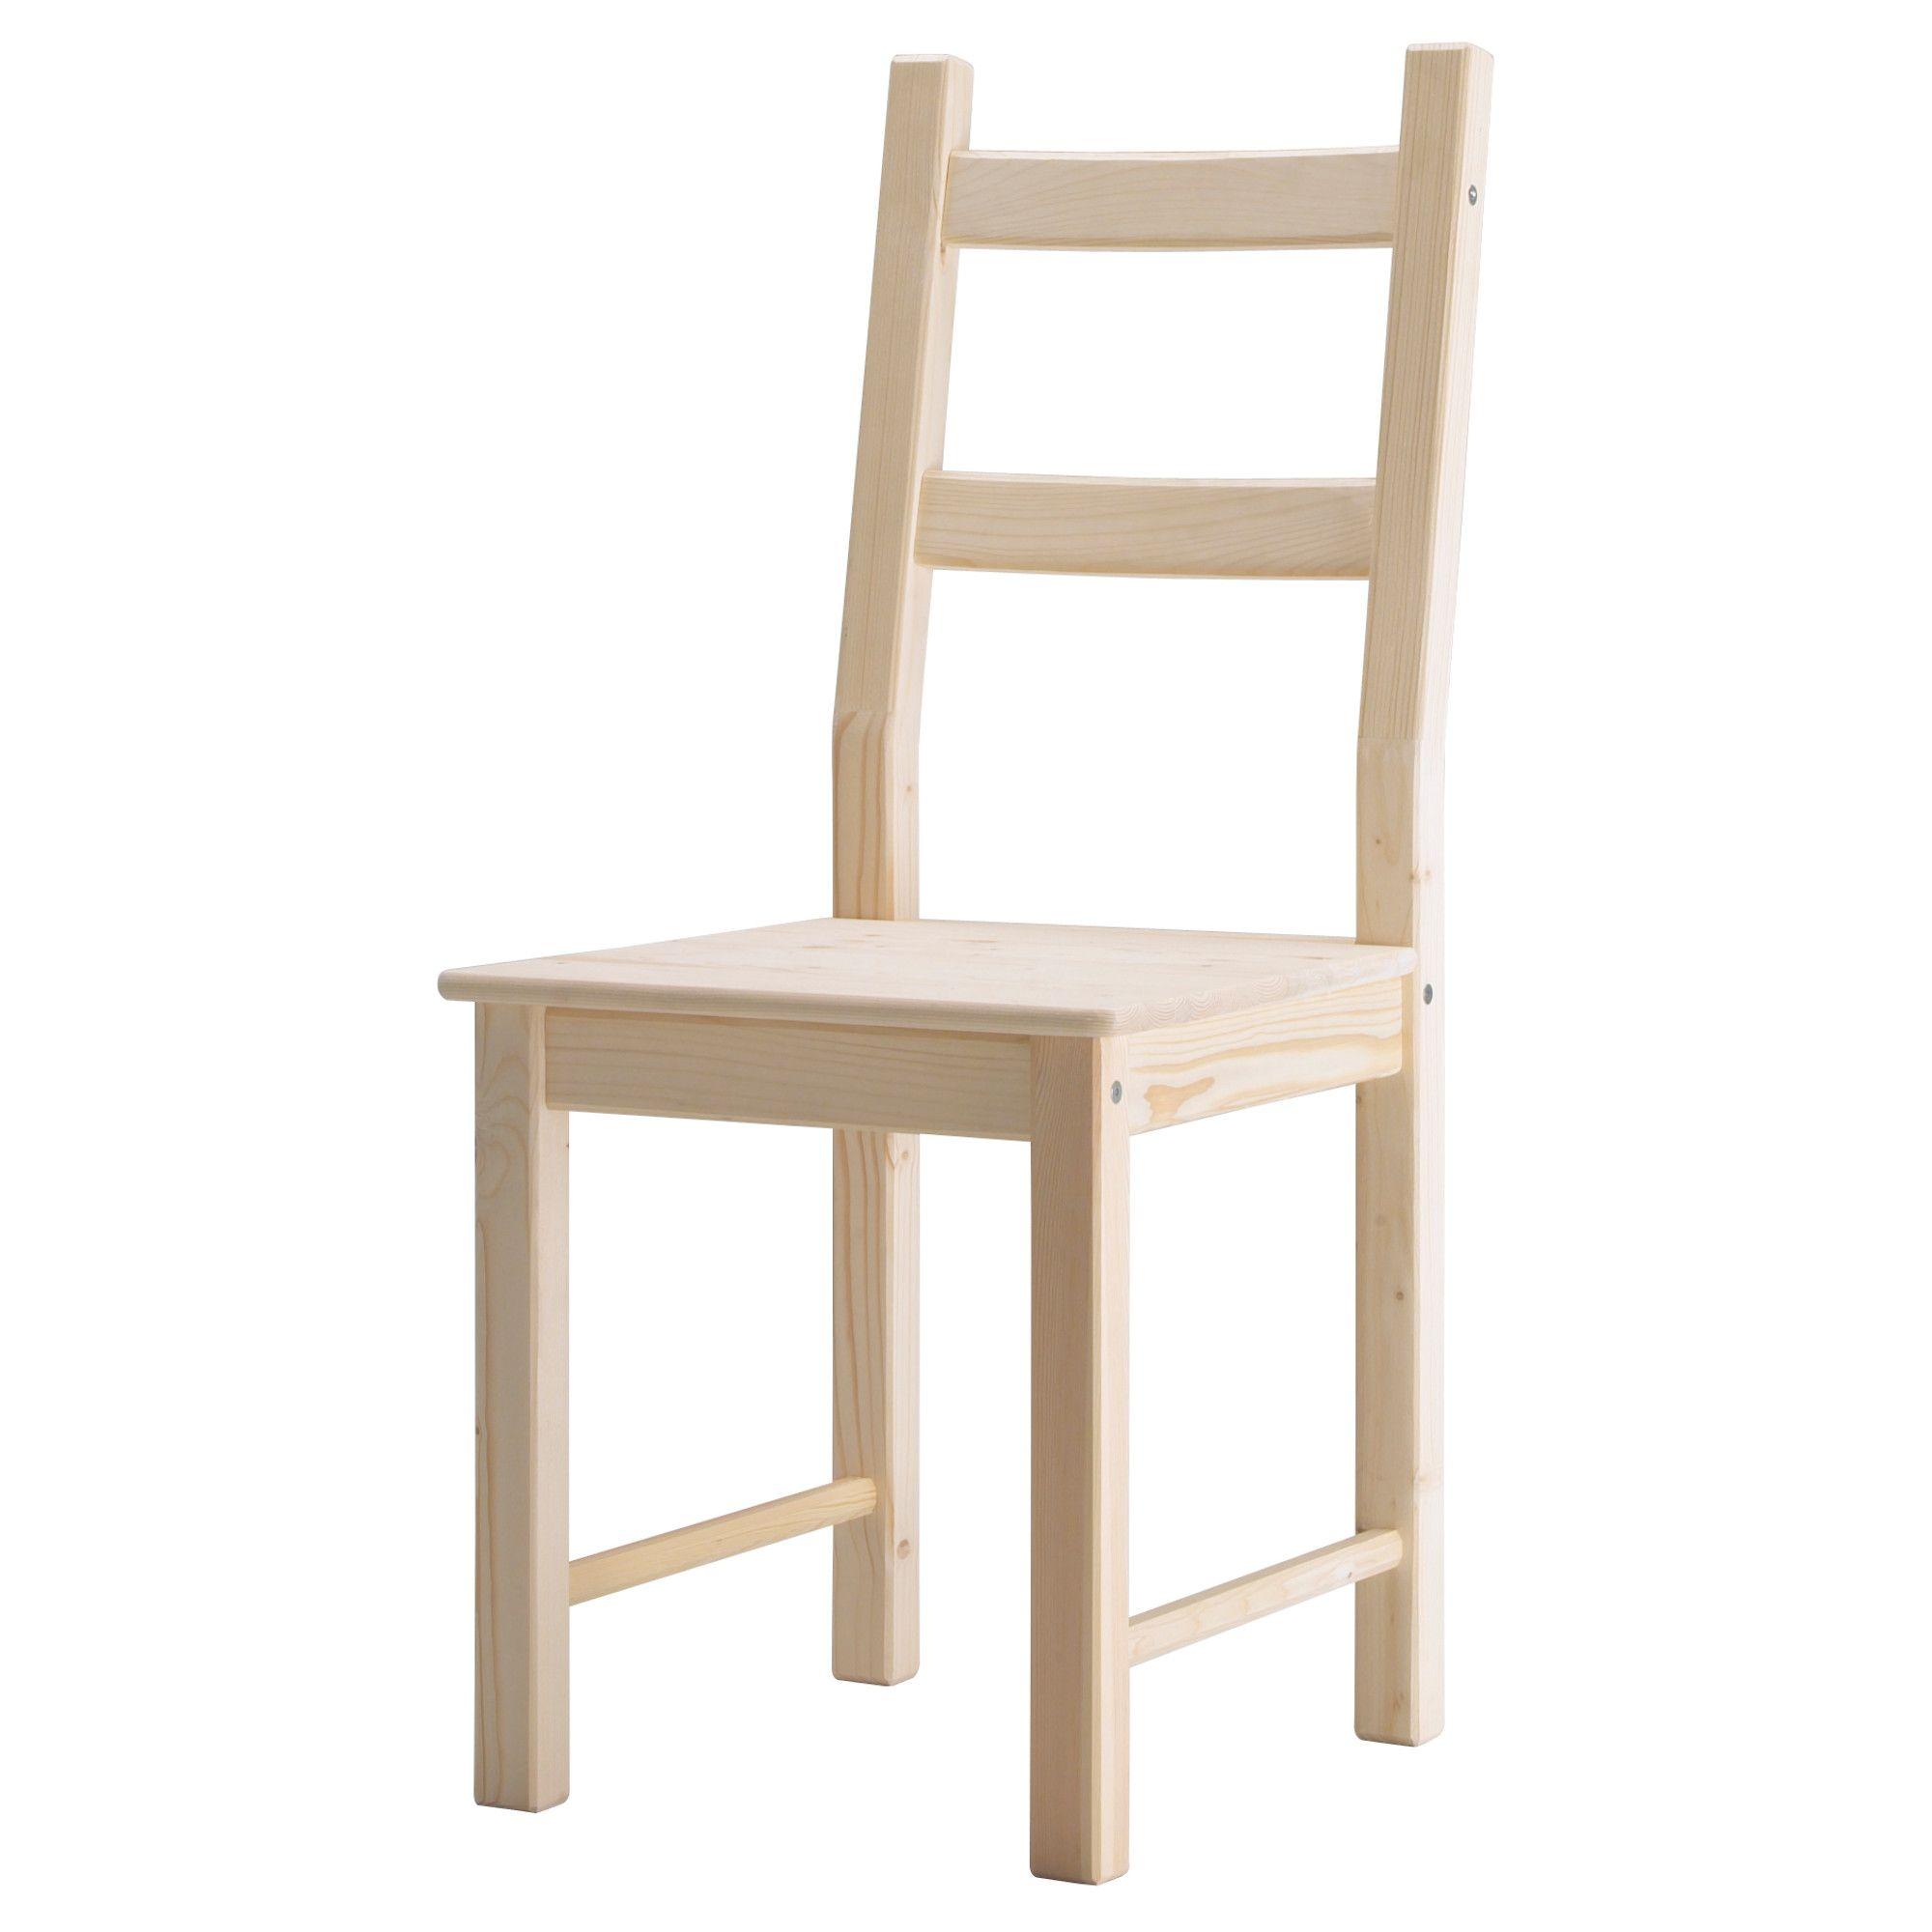 Ikea IVAR Chair 681 560 09 pine $39 99 Solid wood durable